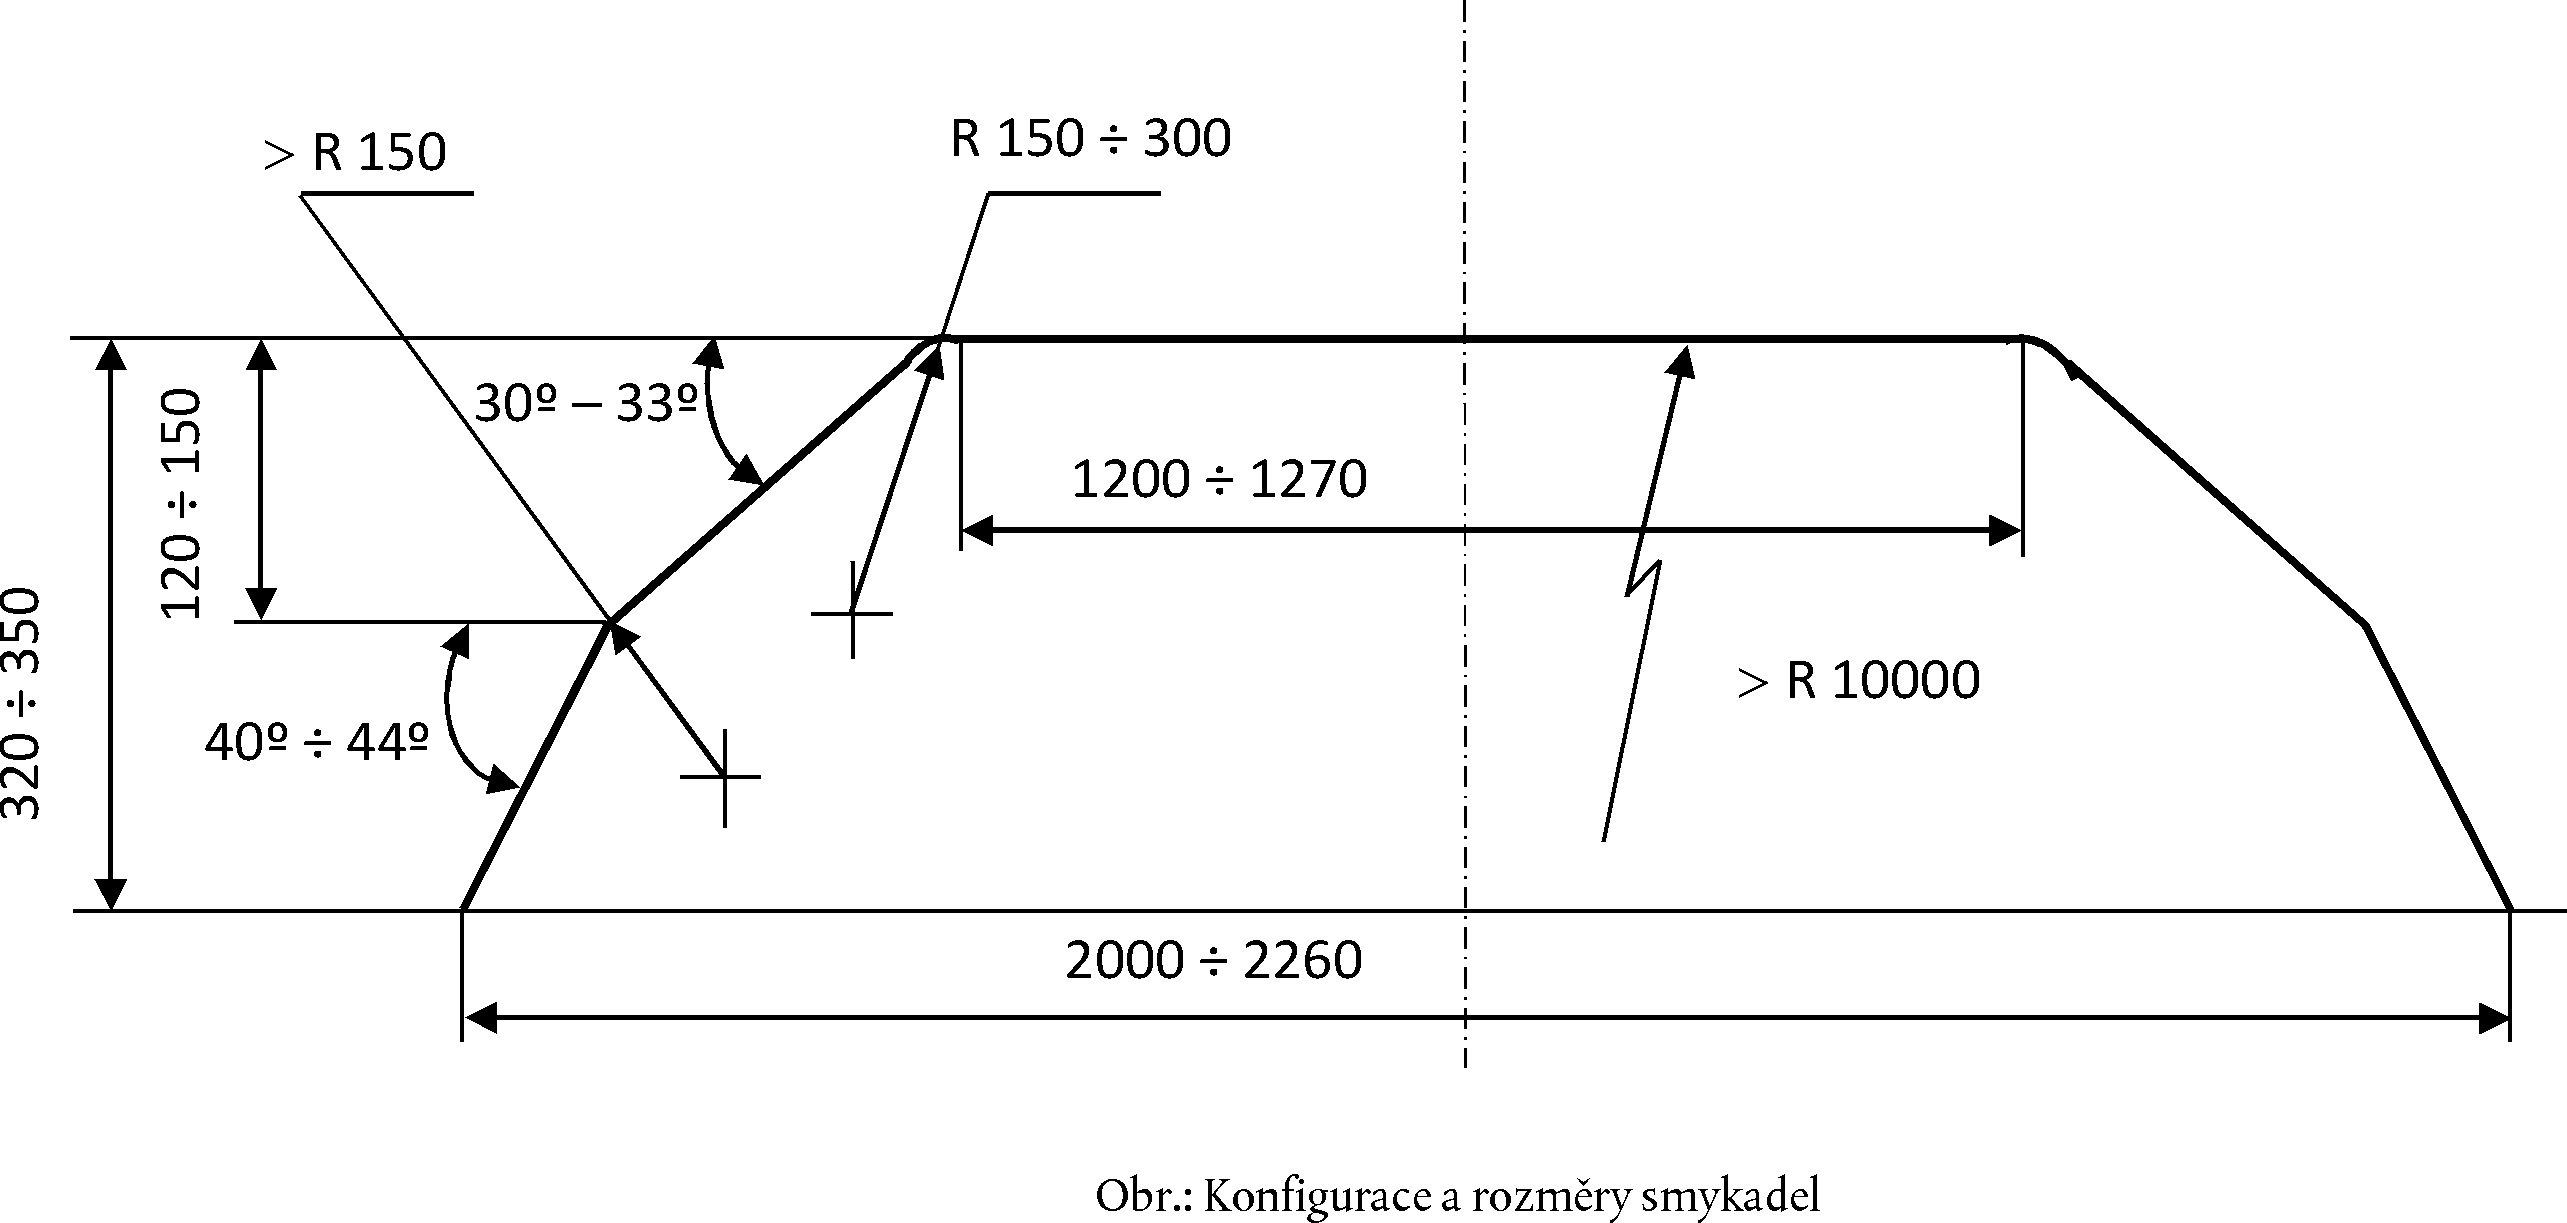 EUR-Lex - 02014R1302-20160705 - EN - EUR-Lex